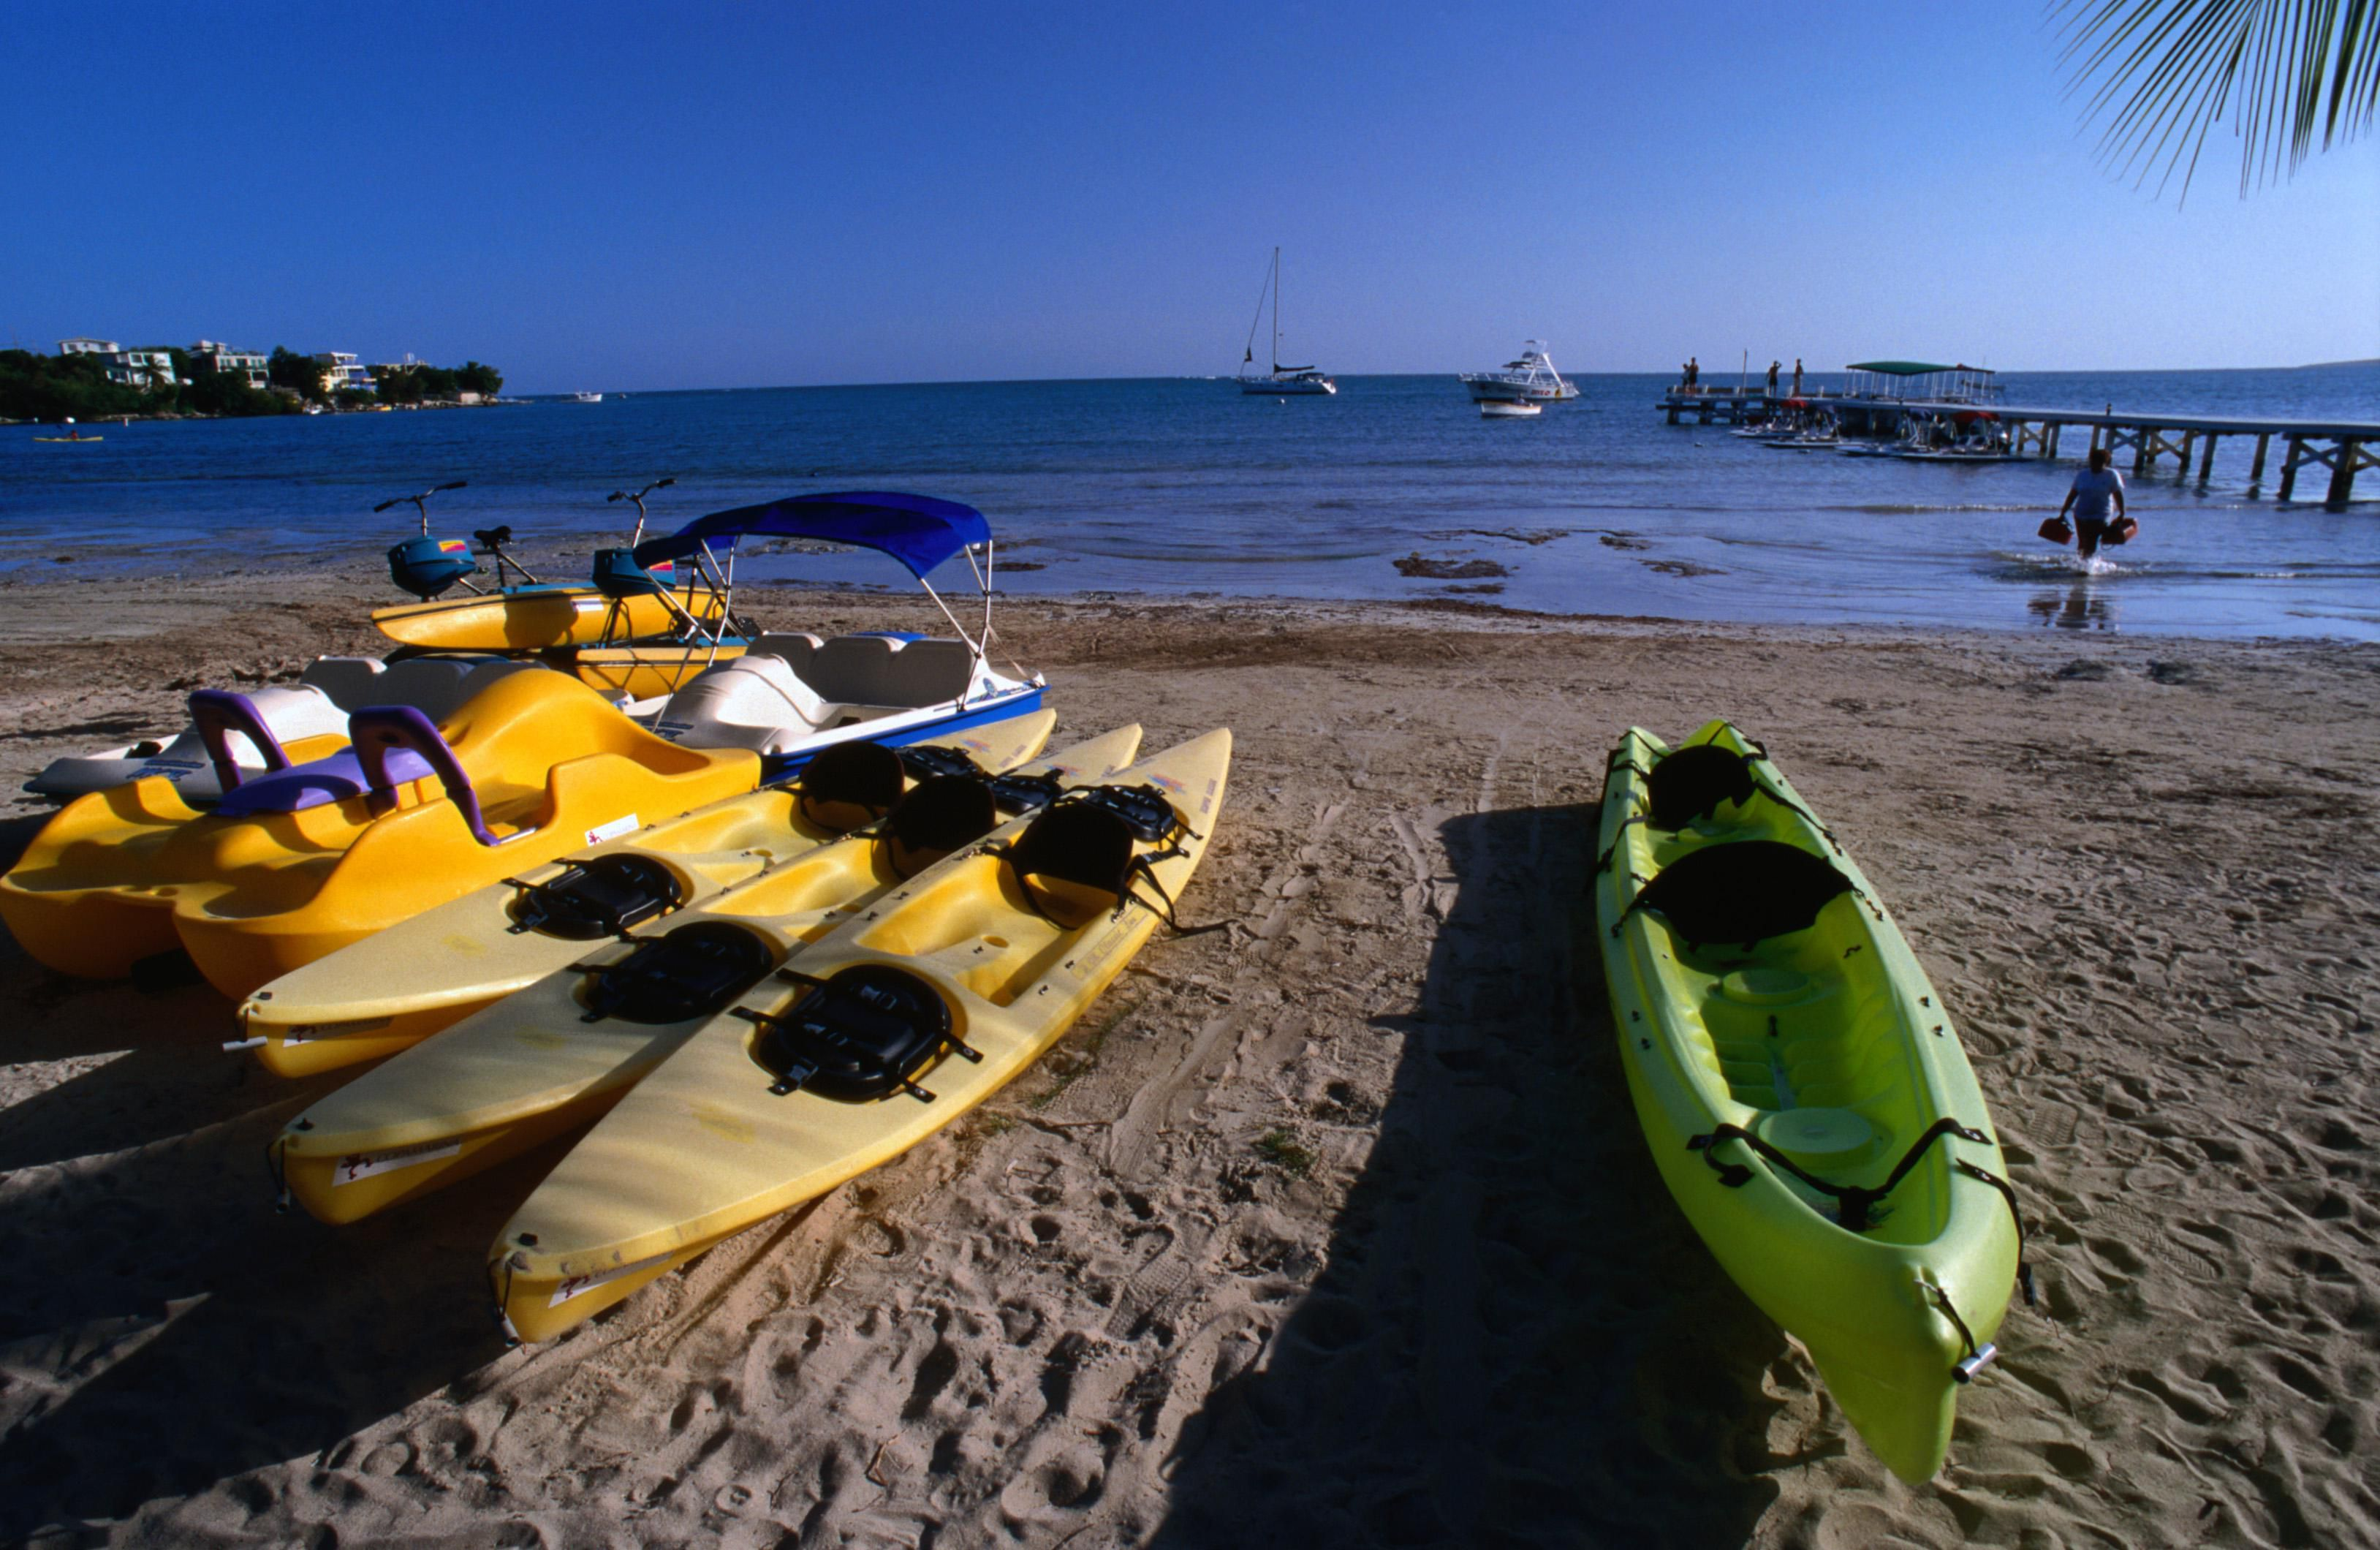 Kayaks wait for passengers Fajardo, Puerto Rico, Central America